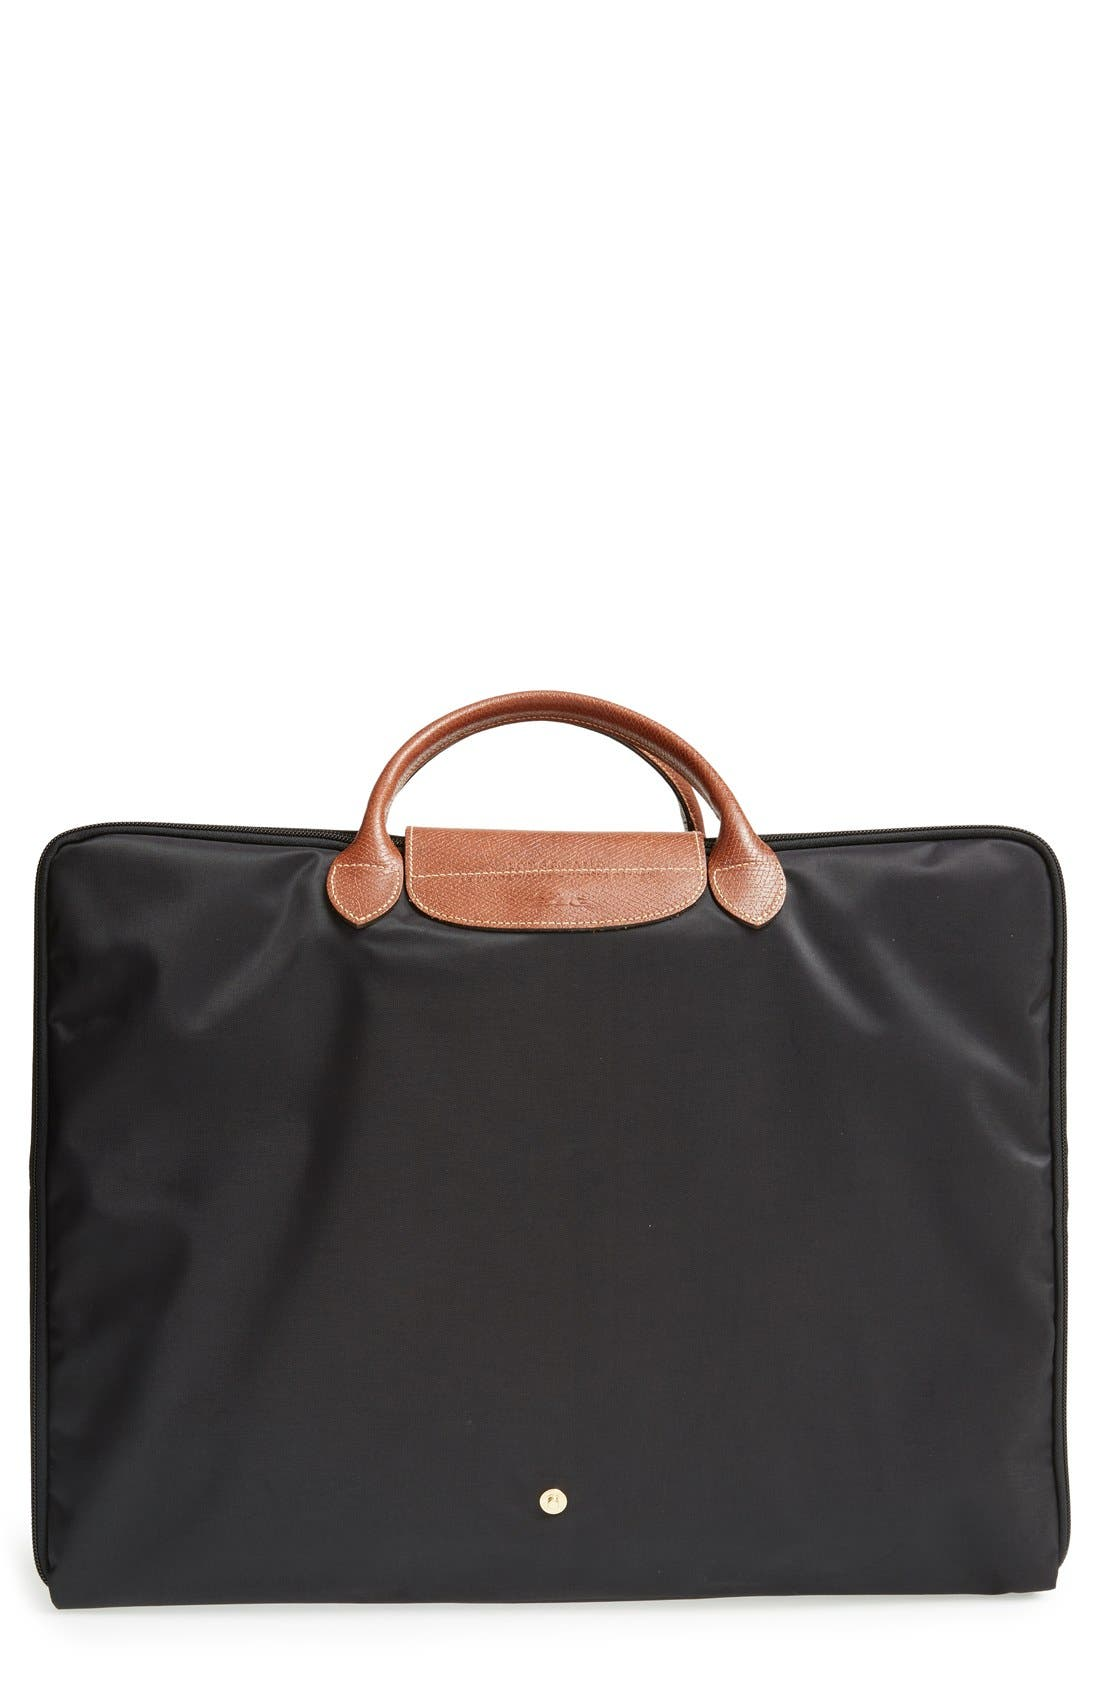 'Le Pliage' Duffel Bag,                             Main thumbnail 1, color,                             001